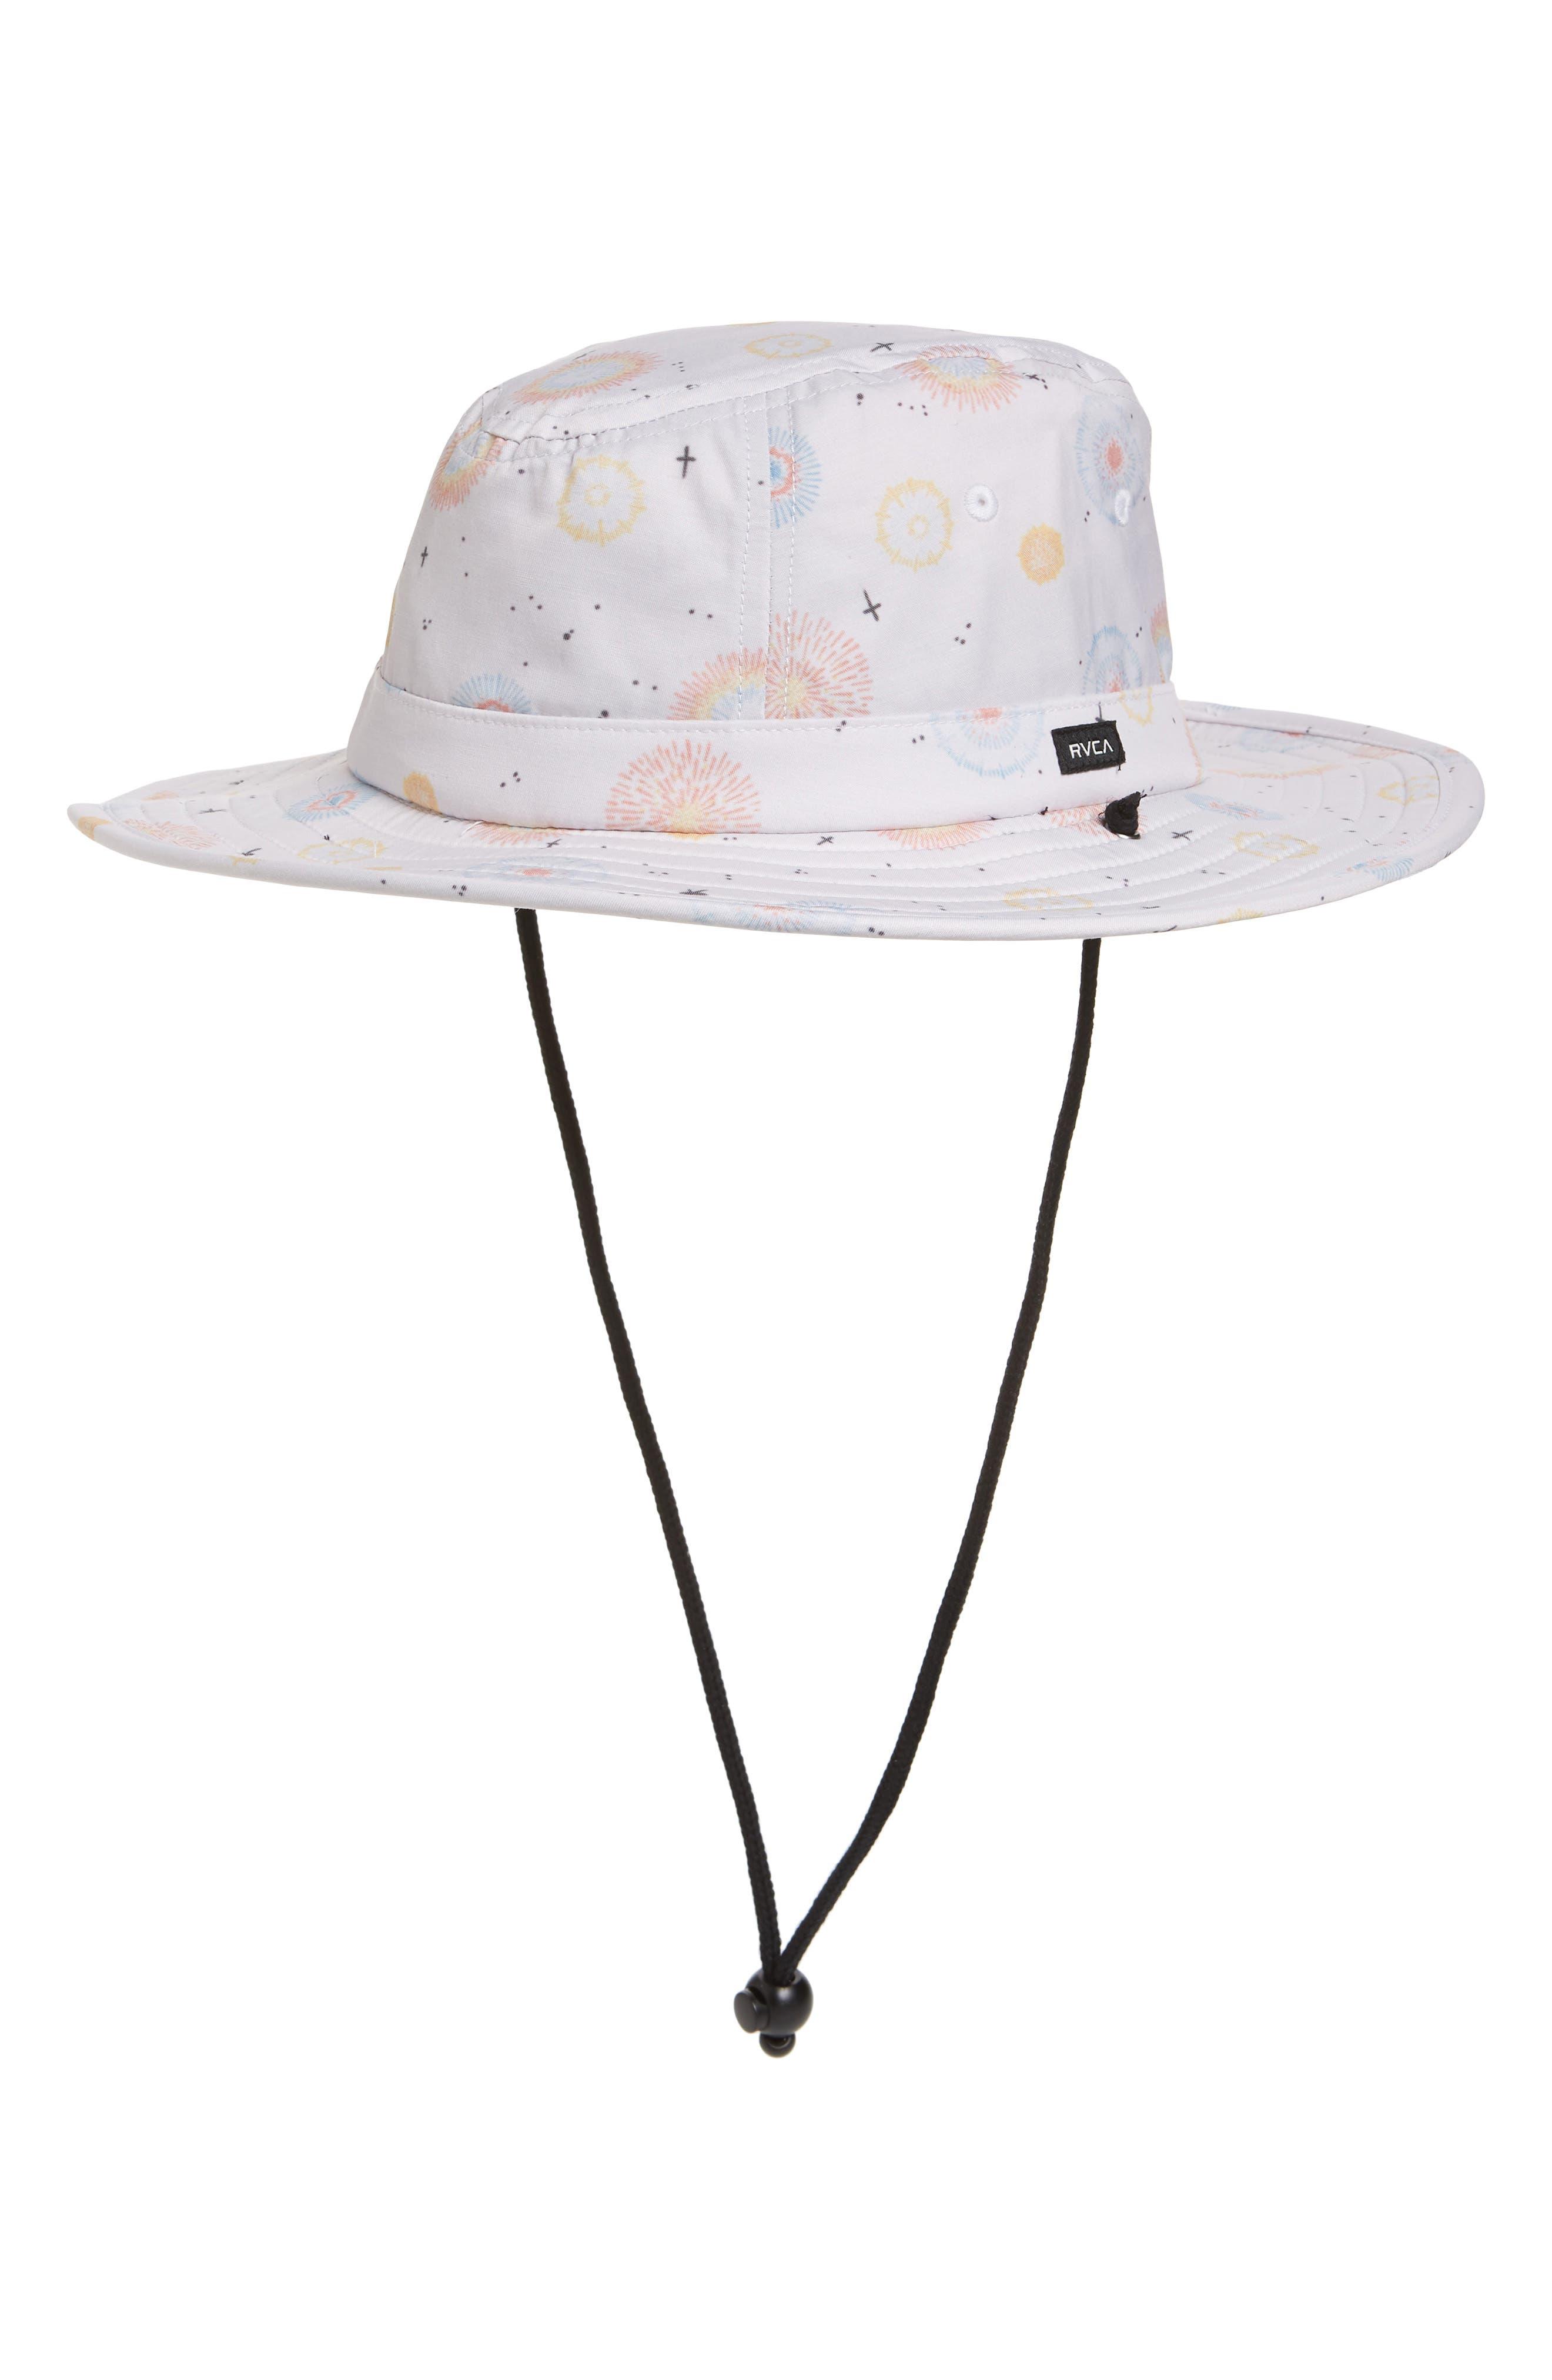 Luke Fireworks Boonie Hat,                             Main thumbnail 1, color,                             ANTIQUE WHITE